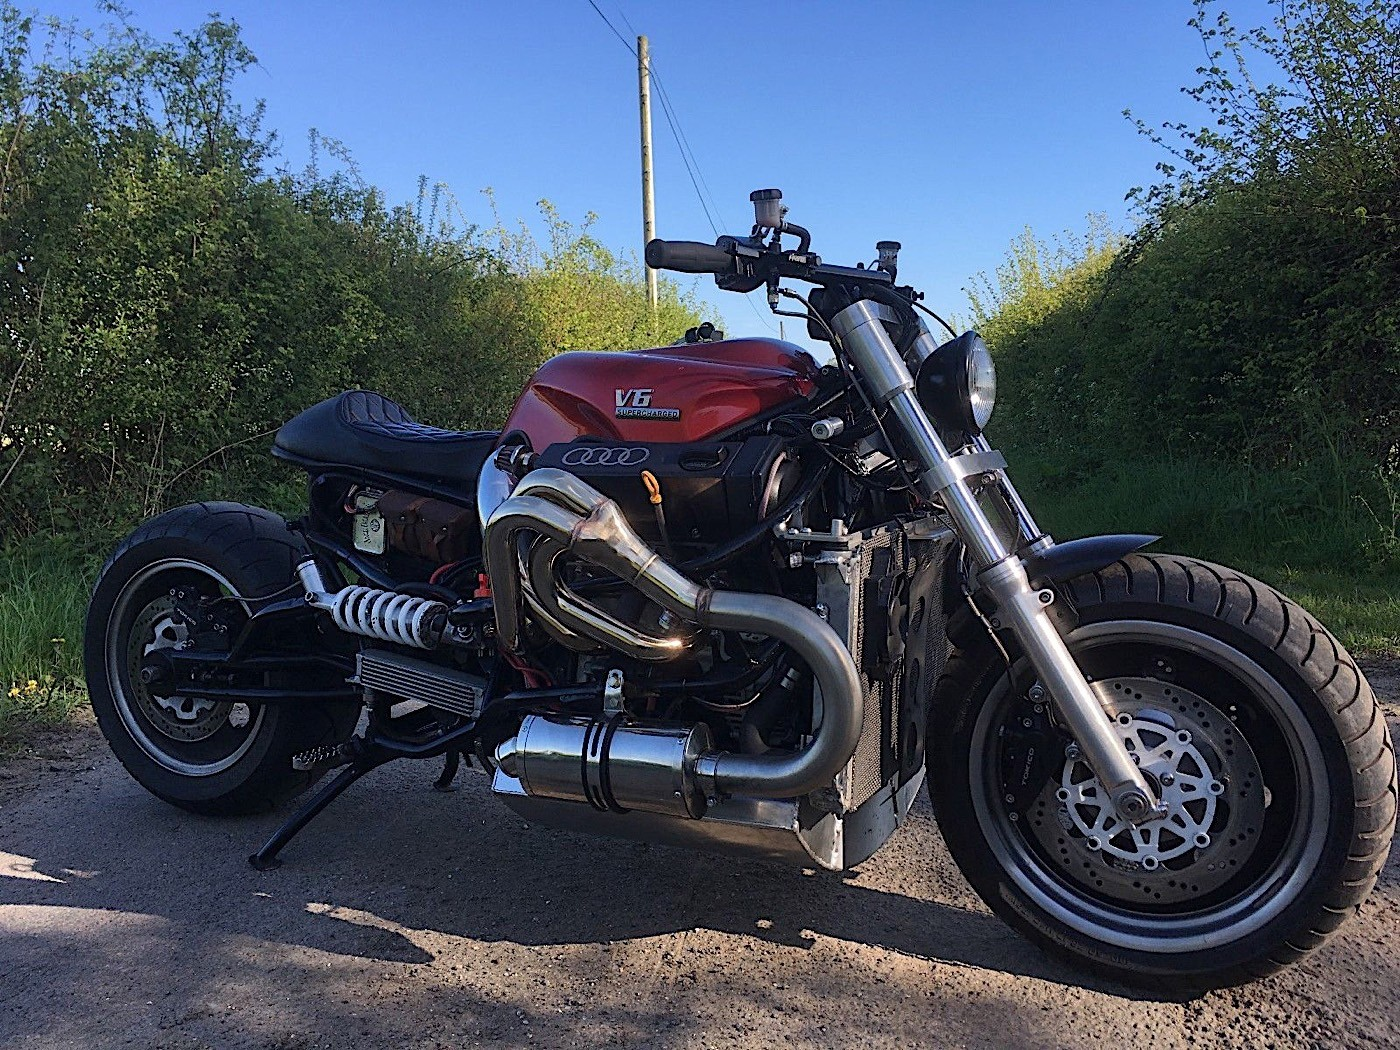 Motocikl sa Audijevim V6 agregatom (galerija)